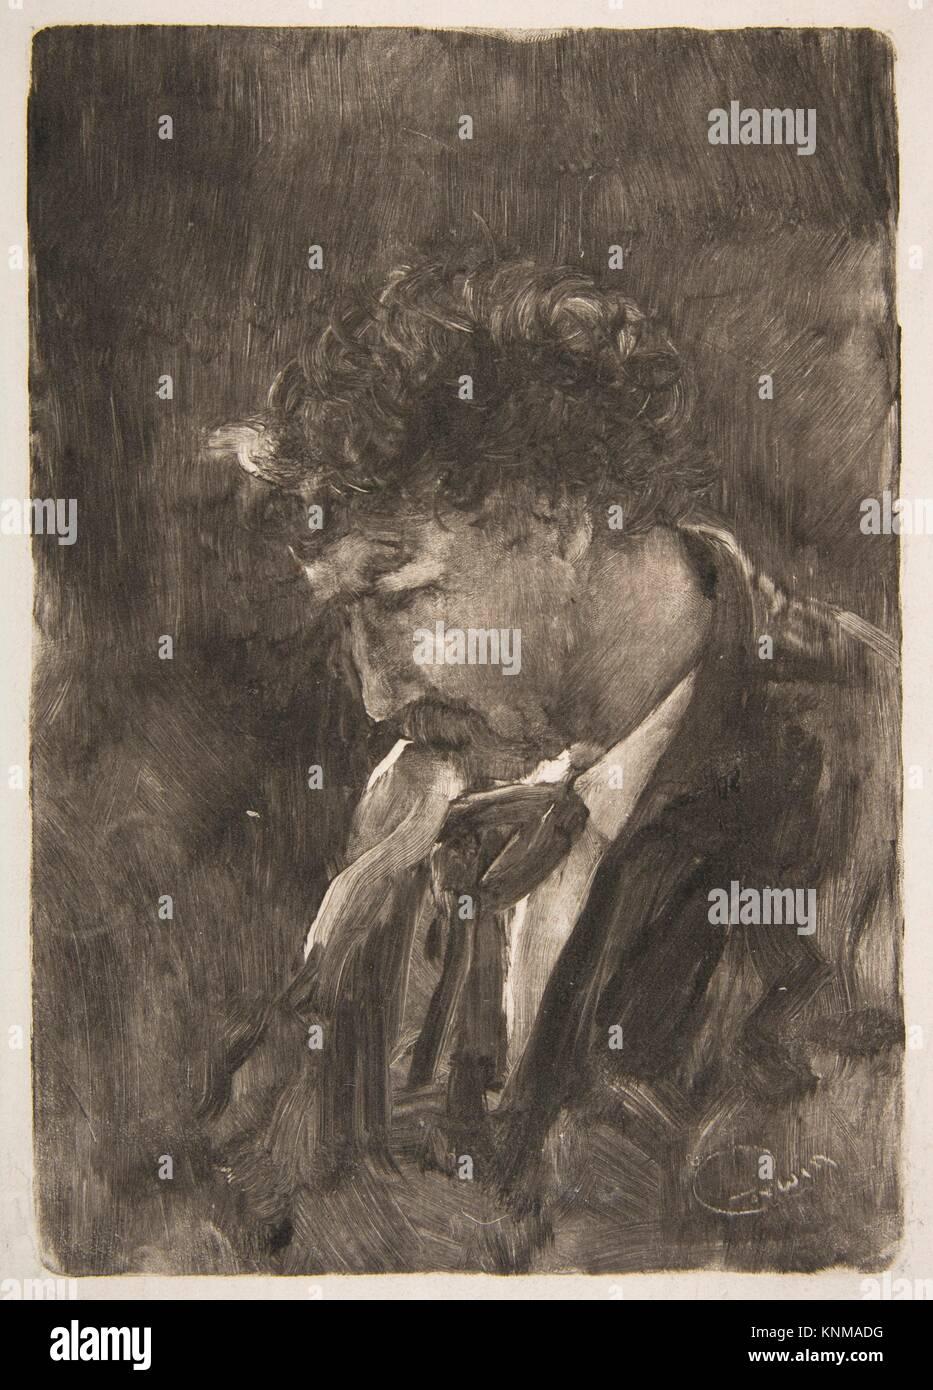 Portrait of James NcNeill Whistler. Artist: Charles Abel Corwin (American, Newburgh, New York 1857-1938 Chicago, - Stock Image